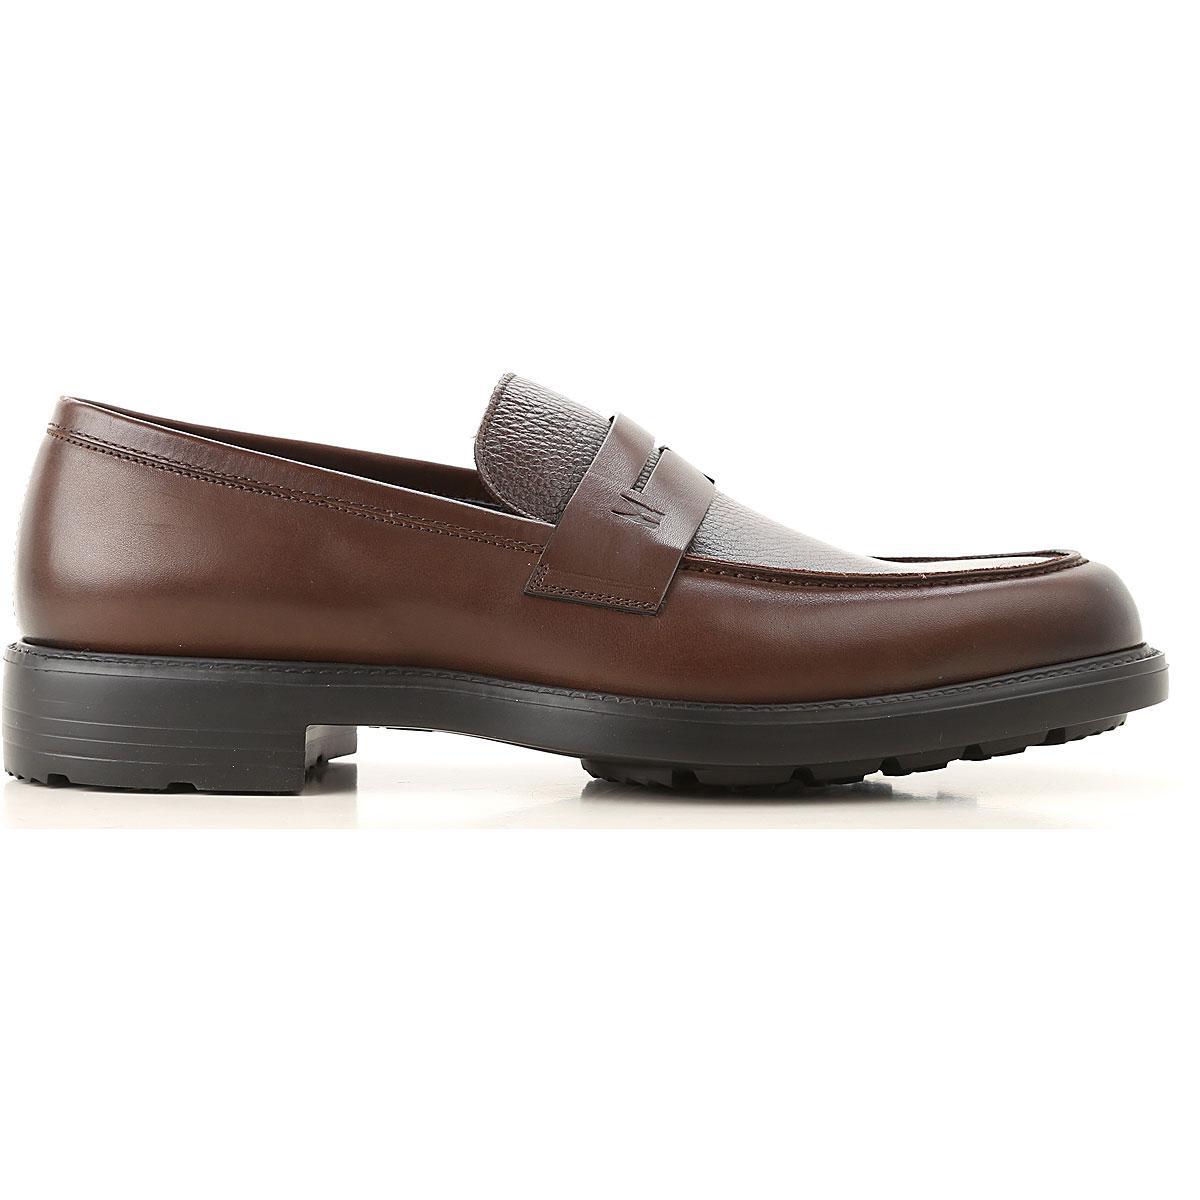 4e0fe1f4cb1 Moreschi Shoes For Men in Brown for Men - Lyst